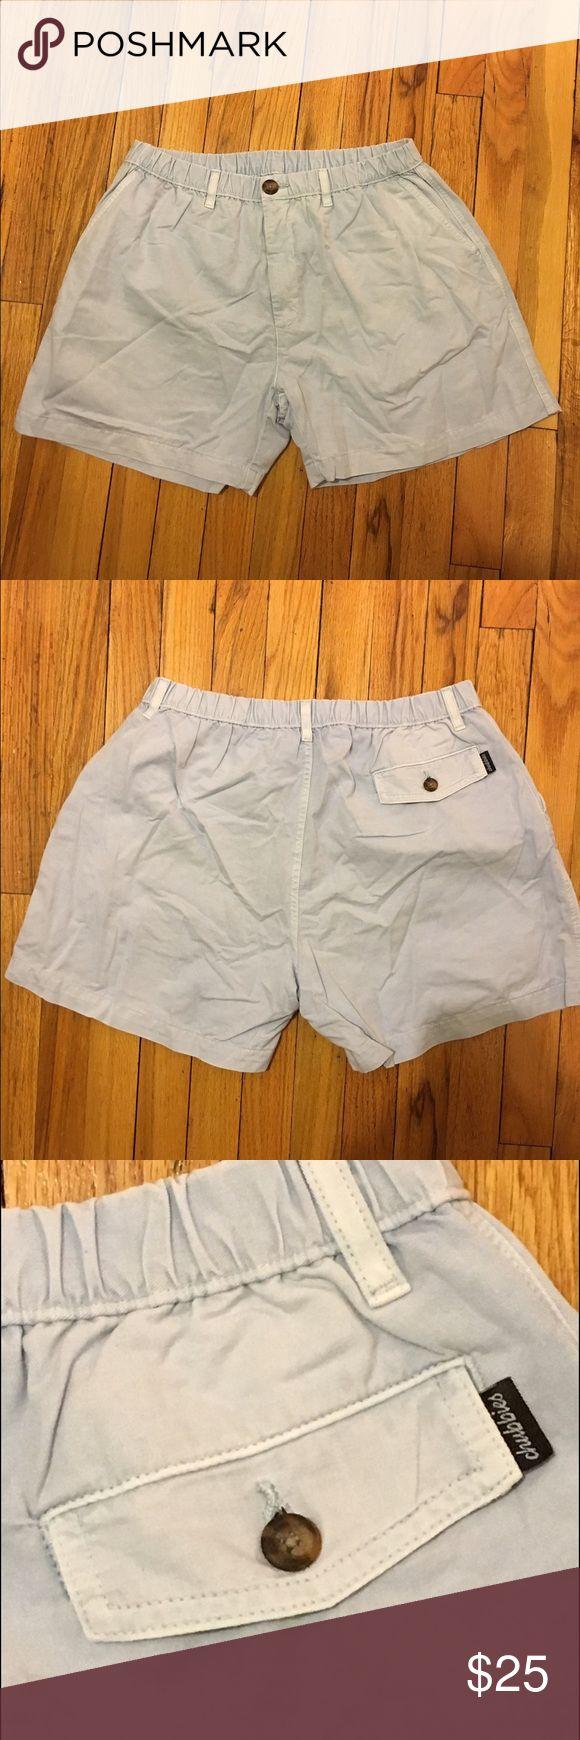 "Chubbies *Brand New* Light Blue Shorts Chubbies light blue shorts. Elastic waistband and zipper closure. 100% cotton. Size XL. Fits waist size 34-37"". Never been worn. Chubbies Shorts Flat Front"